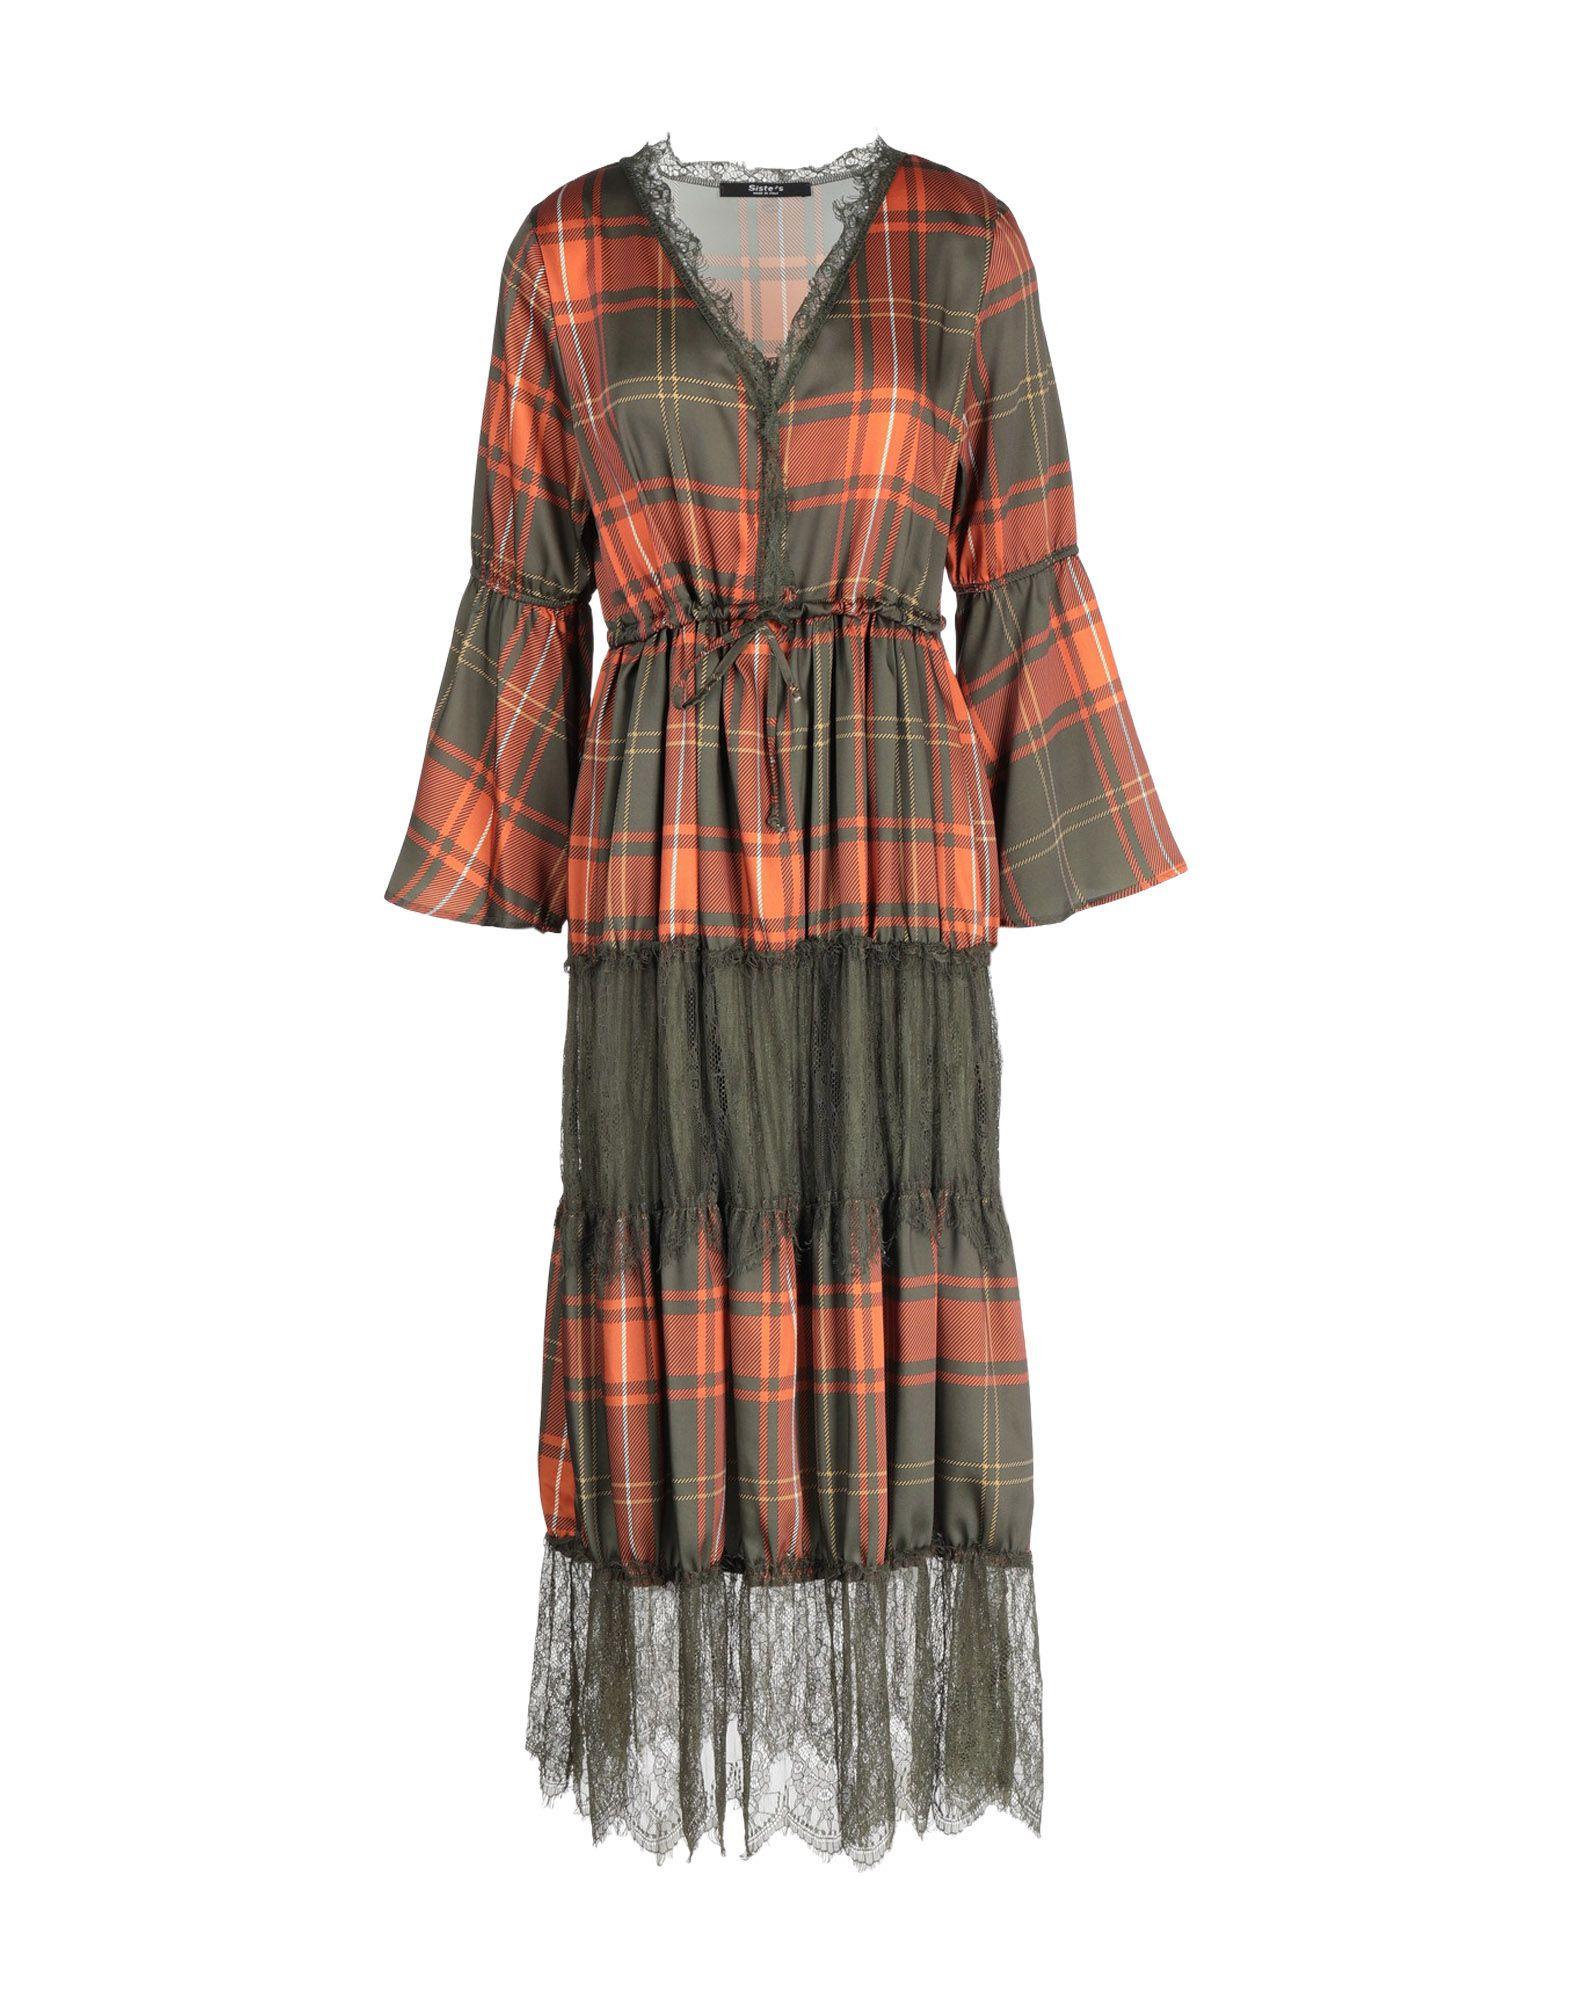 SISTE' S Платье длиной 3/4 sexy v neck 3 4 sleeve loose fitting spliced women s cover up